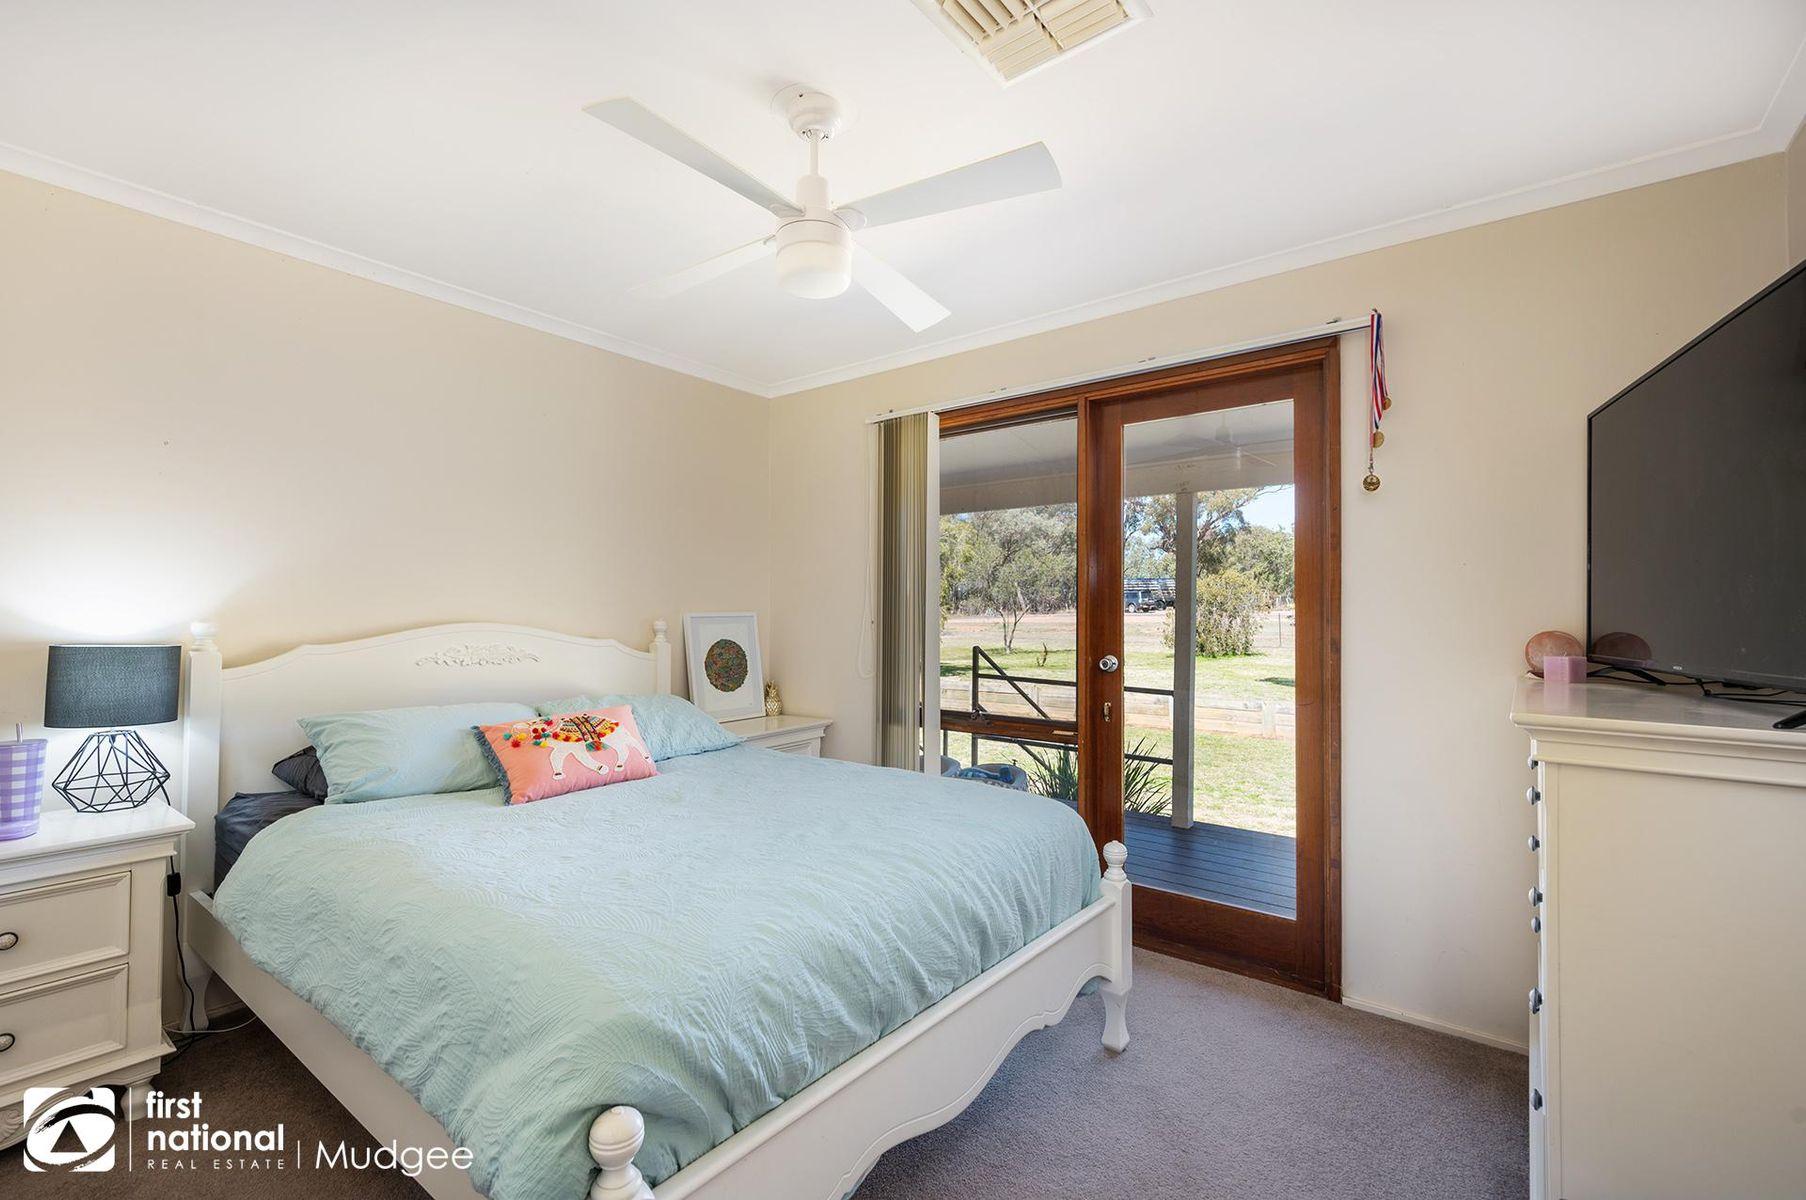 911 Castlereagh Highway, Mudgee, NSW 2850